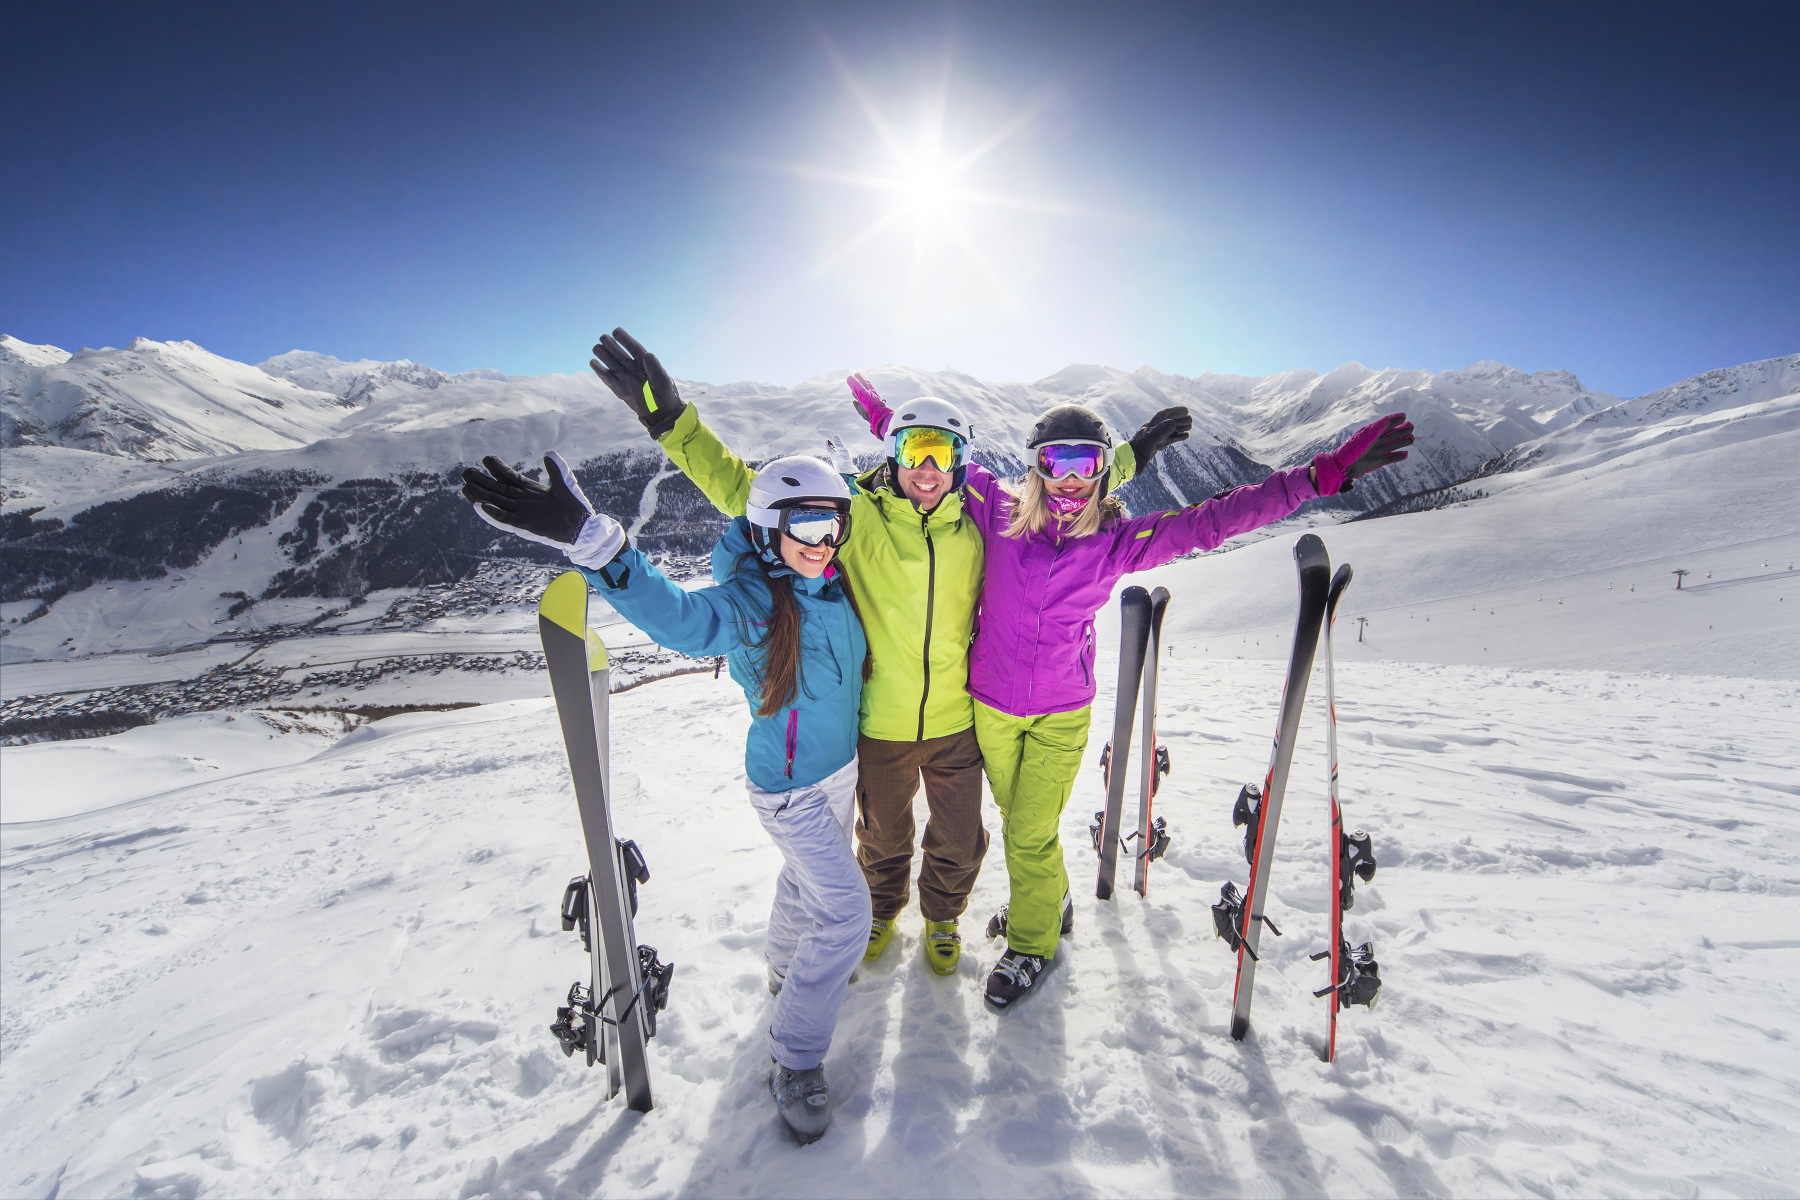 Ski hire Sauze d'Oulx